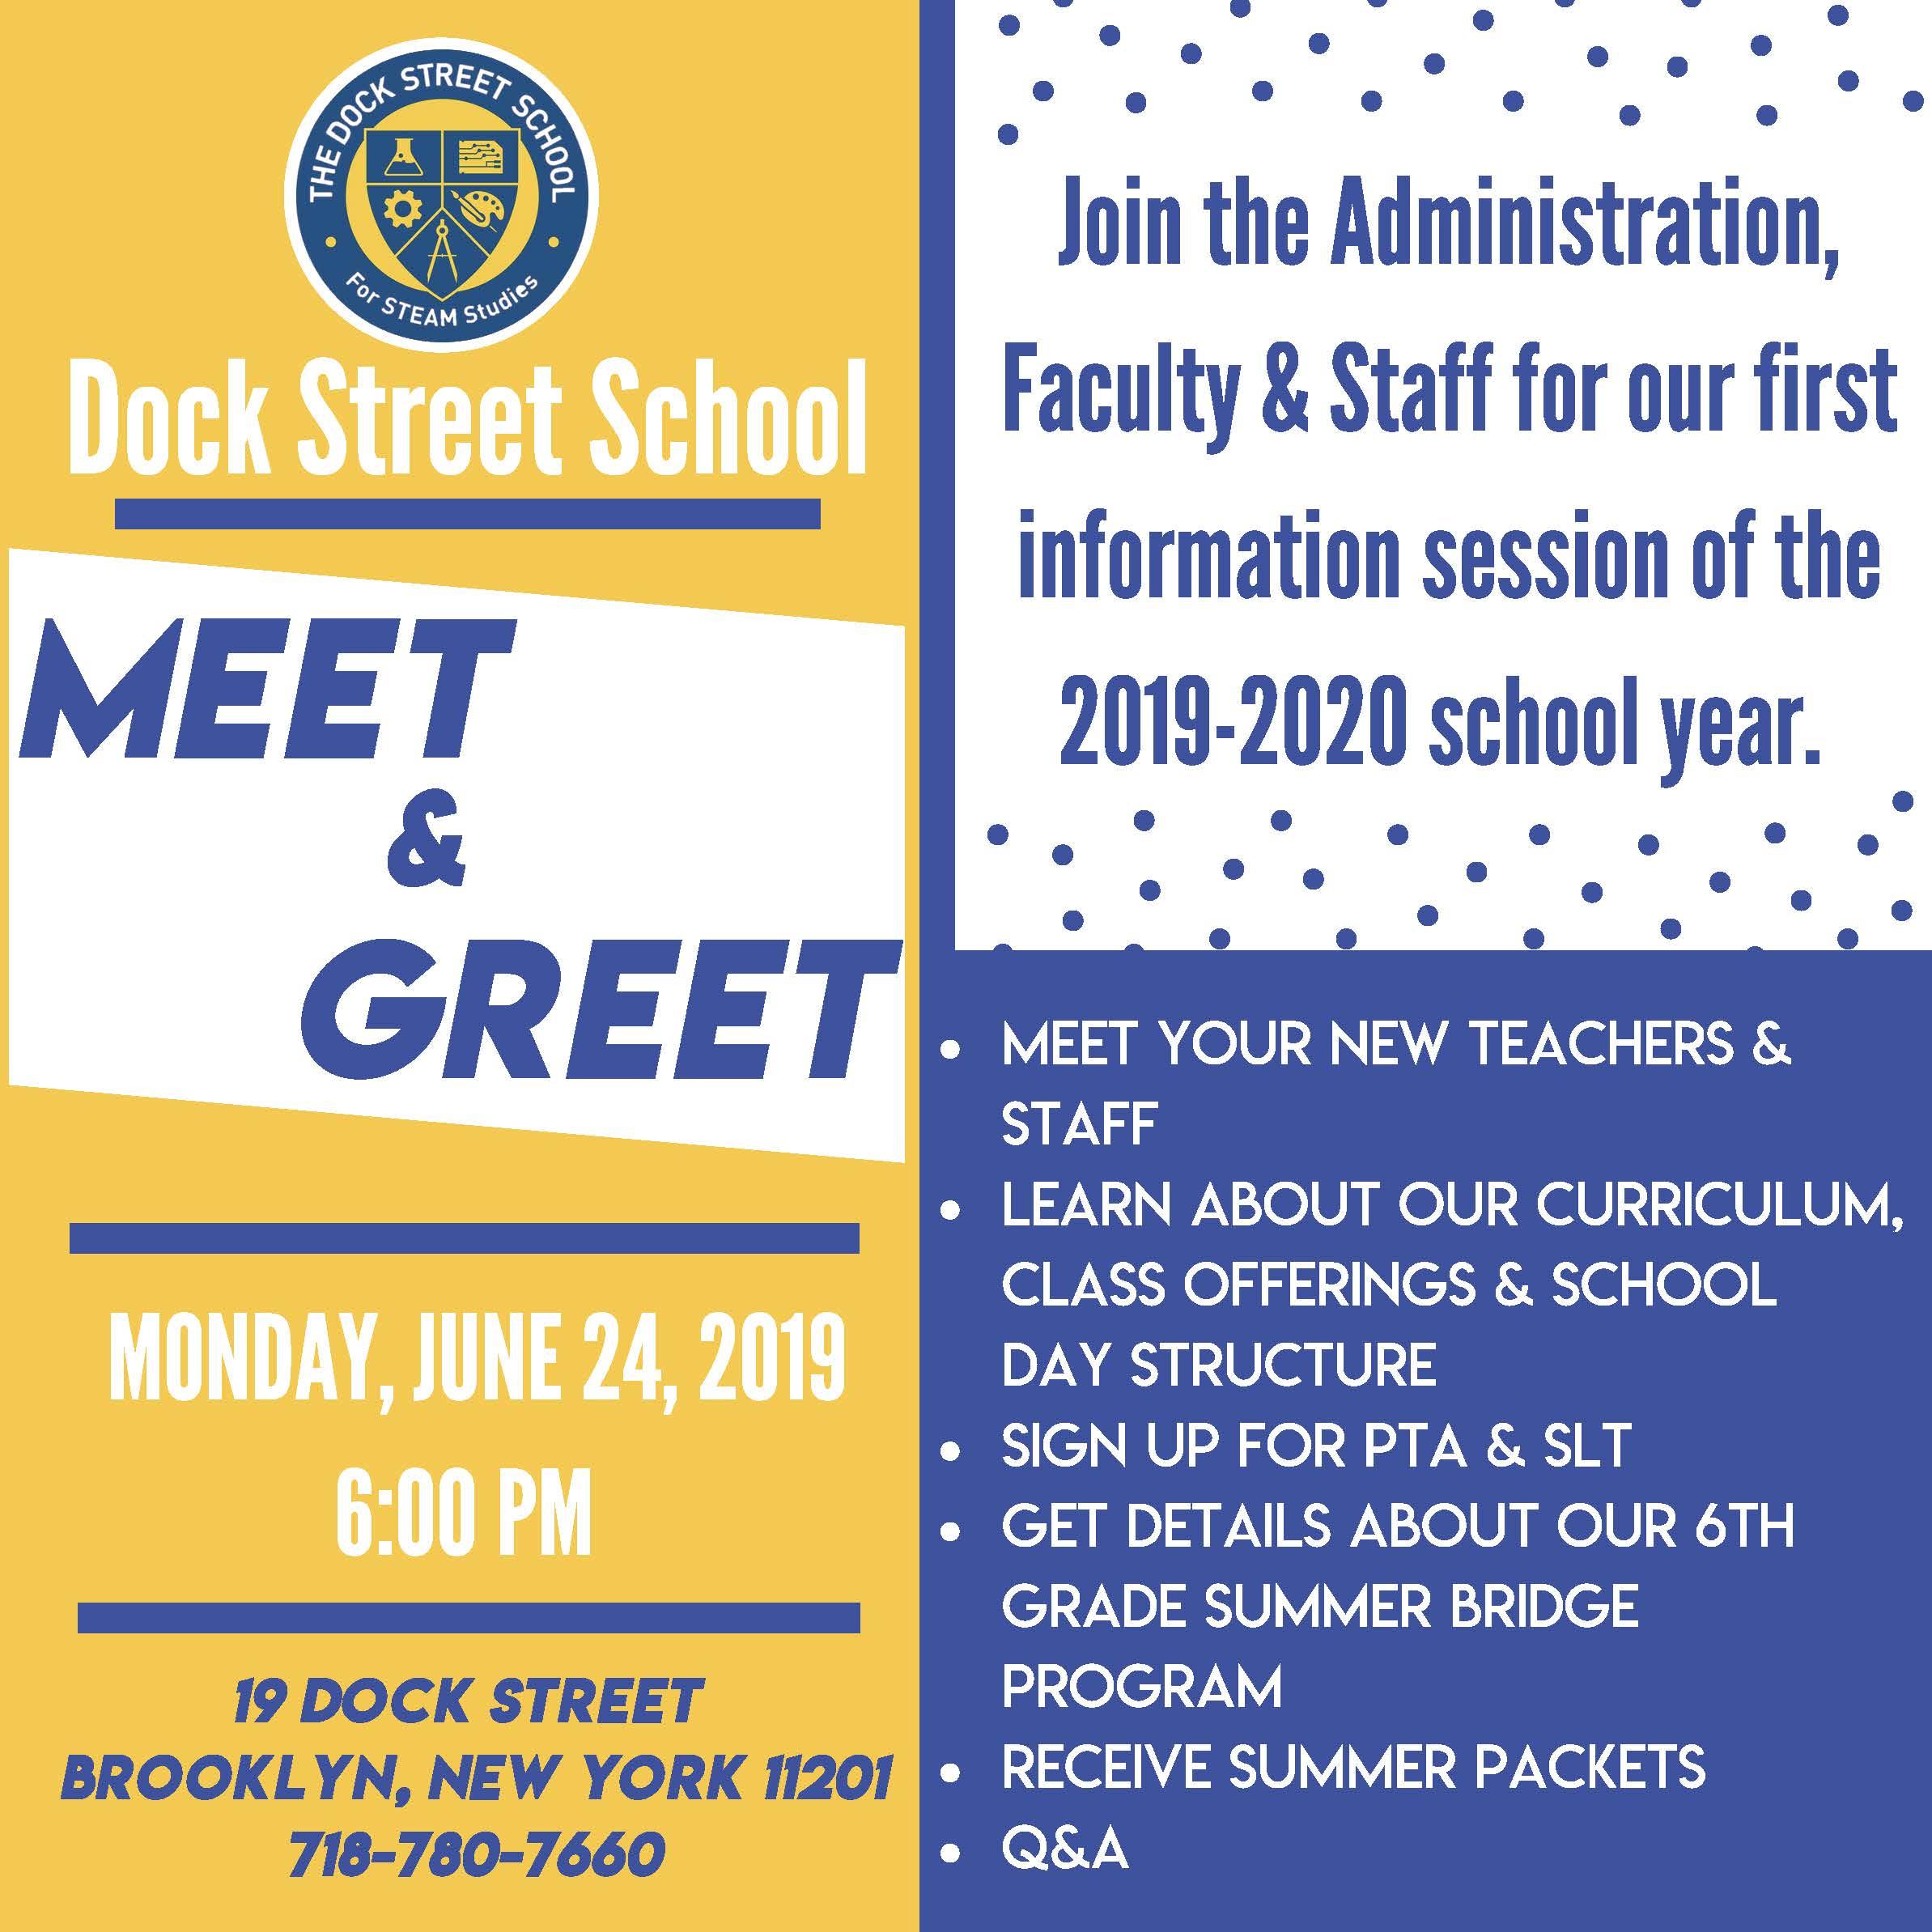 New Parent MEET & GREET – Dock Street School